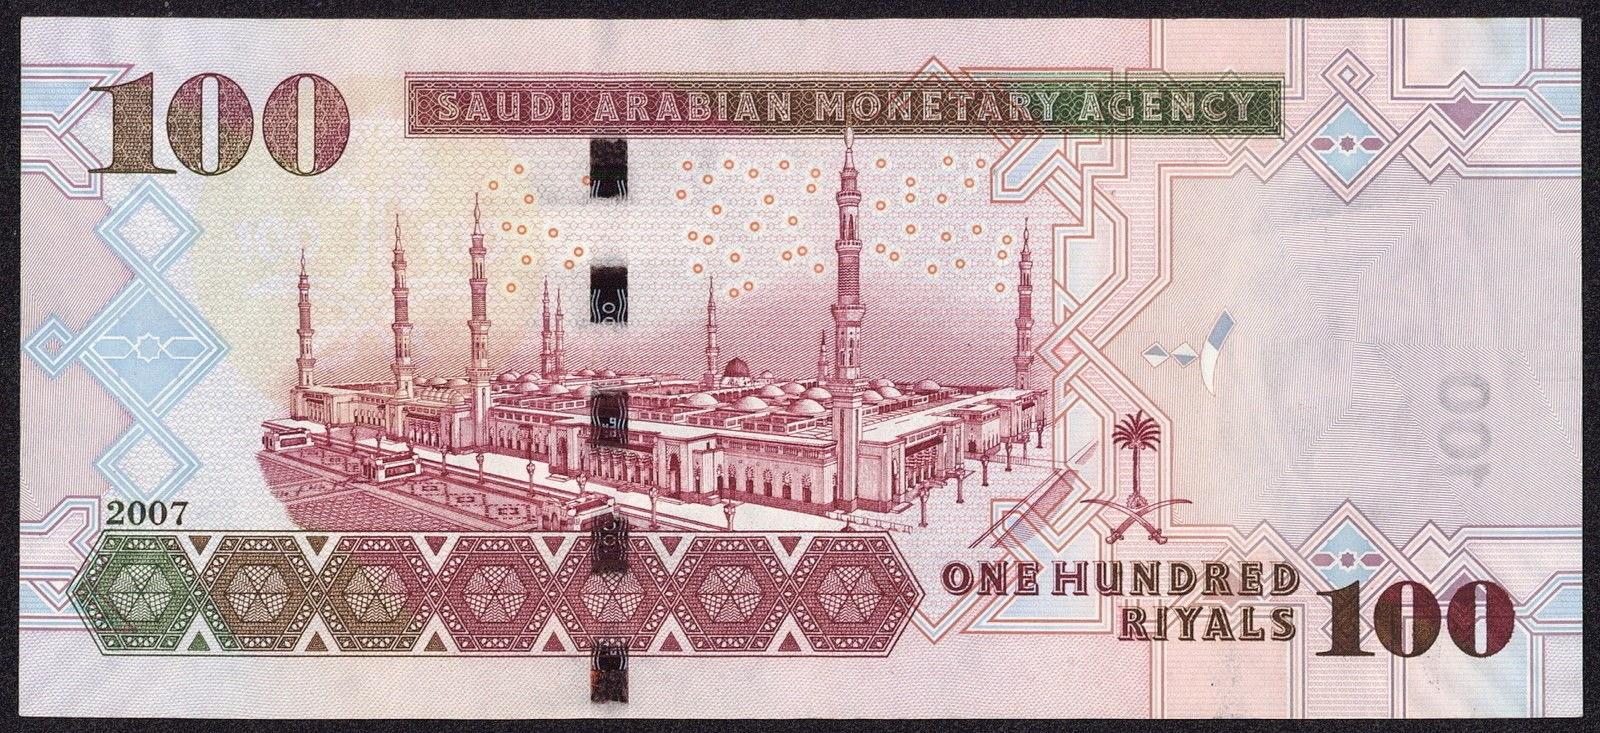 Saudi Arabia Banknotes 100 Saudi Riyals Note 2007